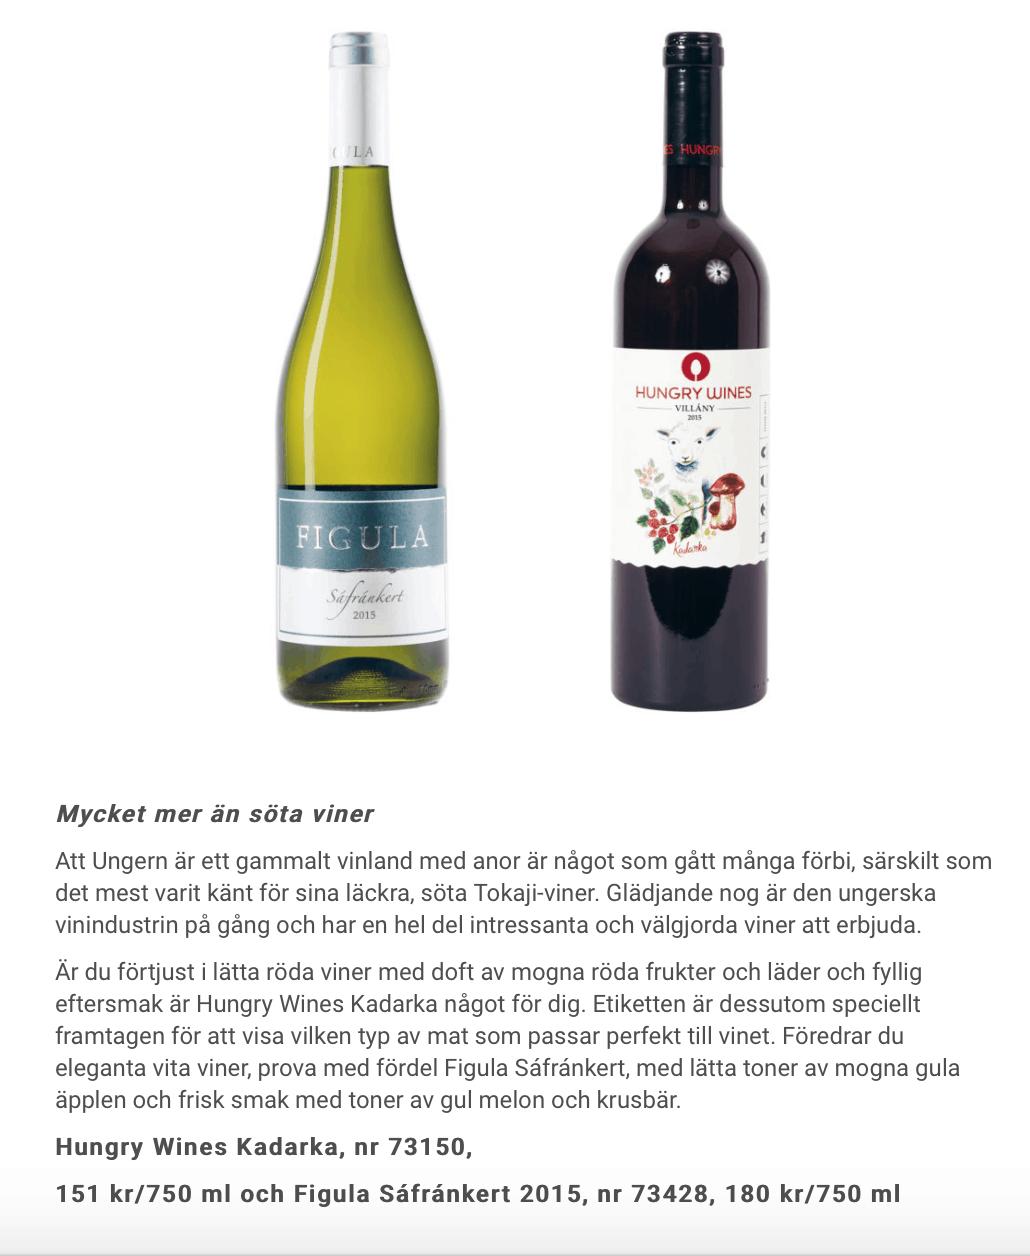 Inrikesmagasinet vintips Hungry Wines Kadarka Amalia Gonzales Stöckel